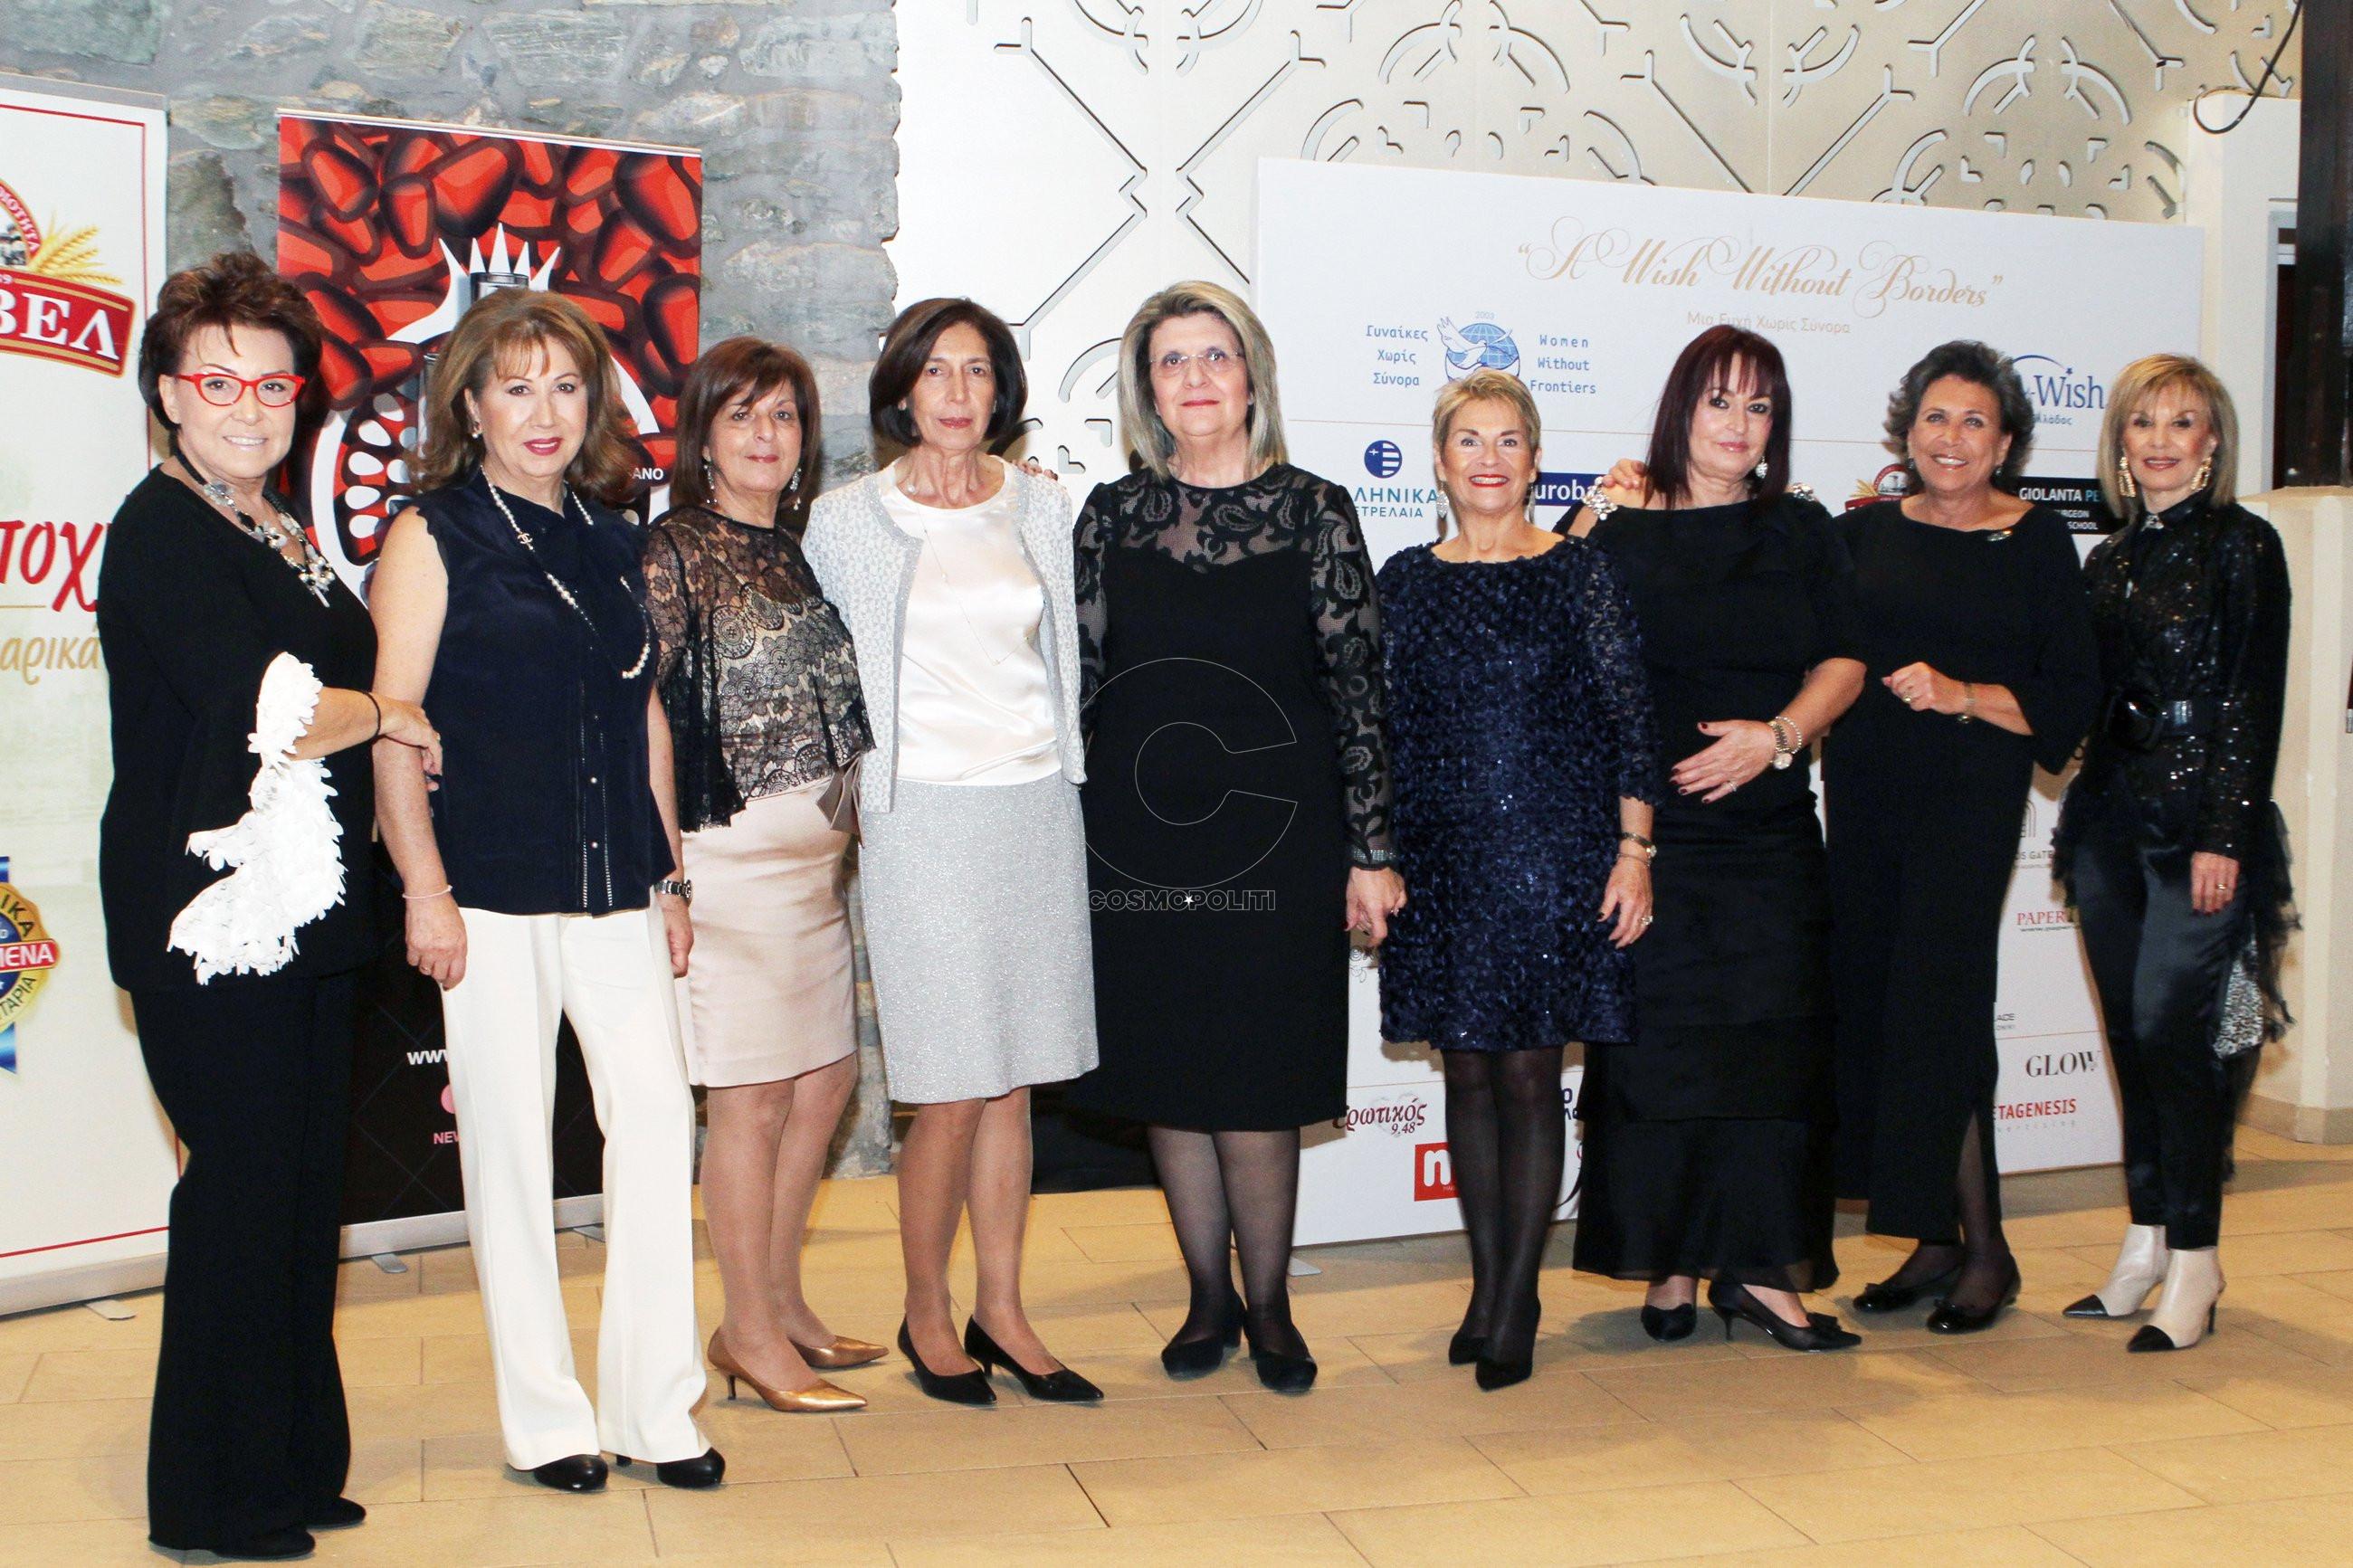 d7addbb5ea Με μεγάλη επιτυχία πραγματοποιήθηκε η χριστουγεννιάτικη εκδήλωση «A Wish  Without Borders» που διοργάνωσαν από κοινού τα σωματεία «Γυναίκες Χωρίς  Σύνορα» ...